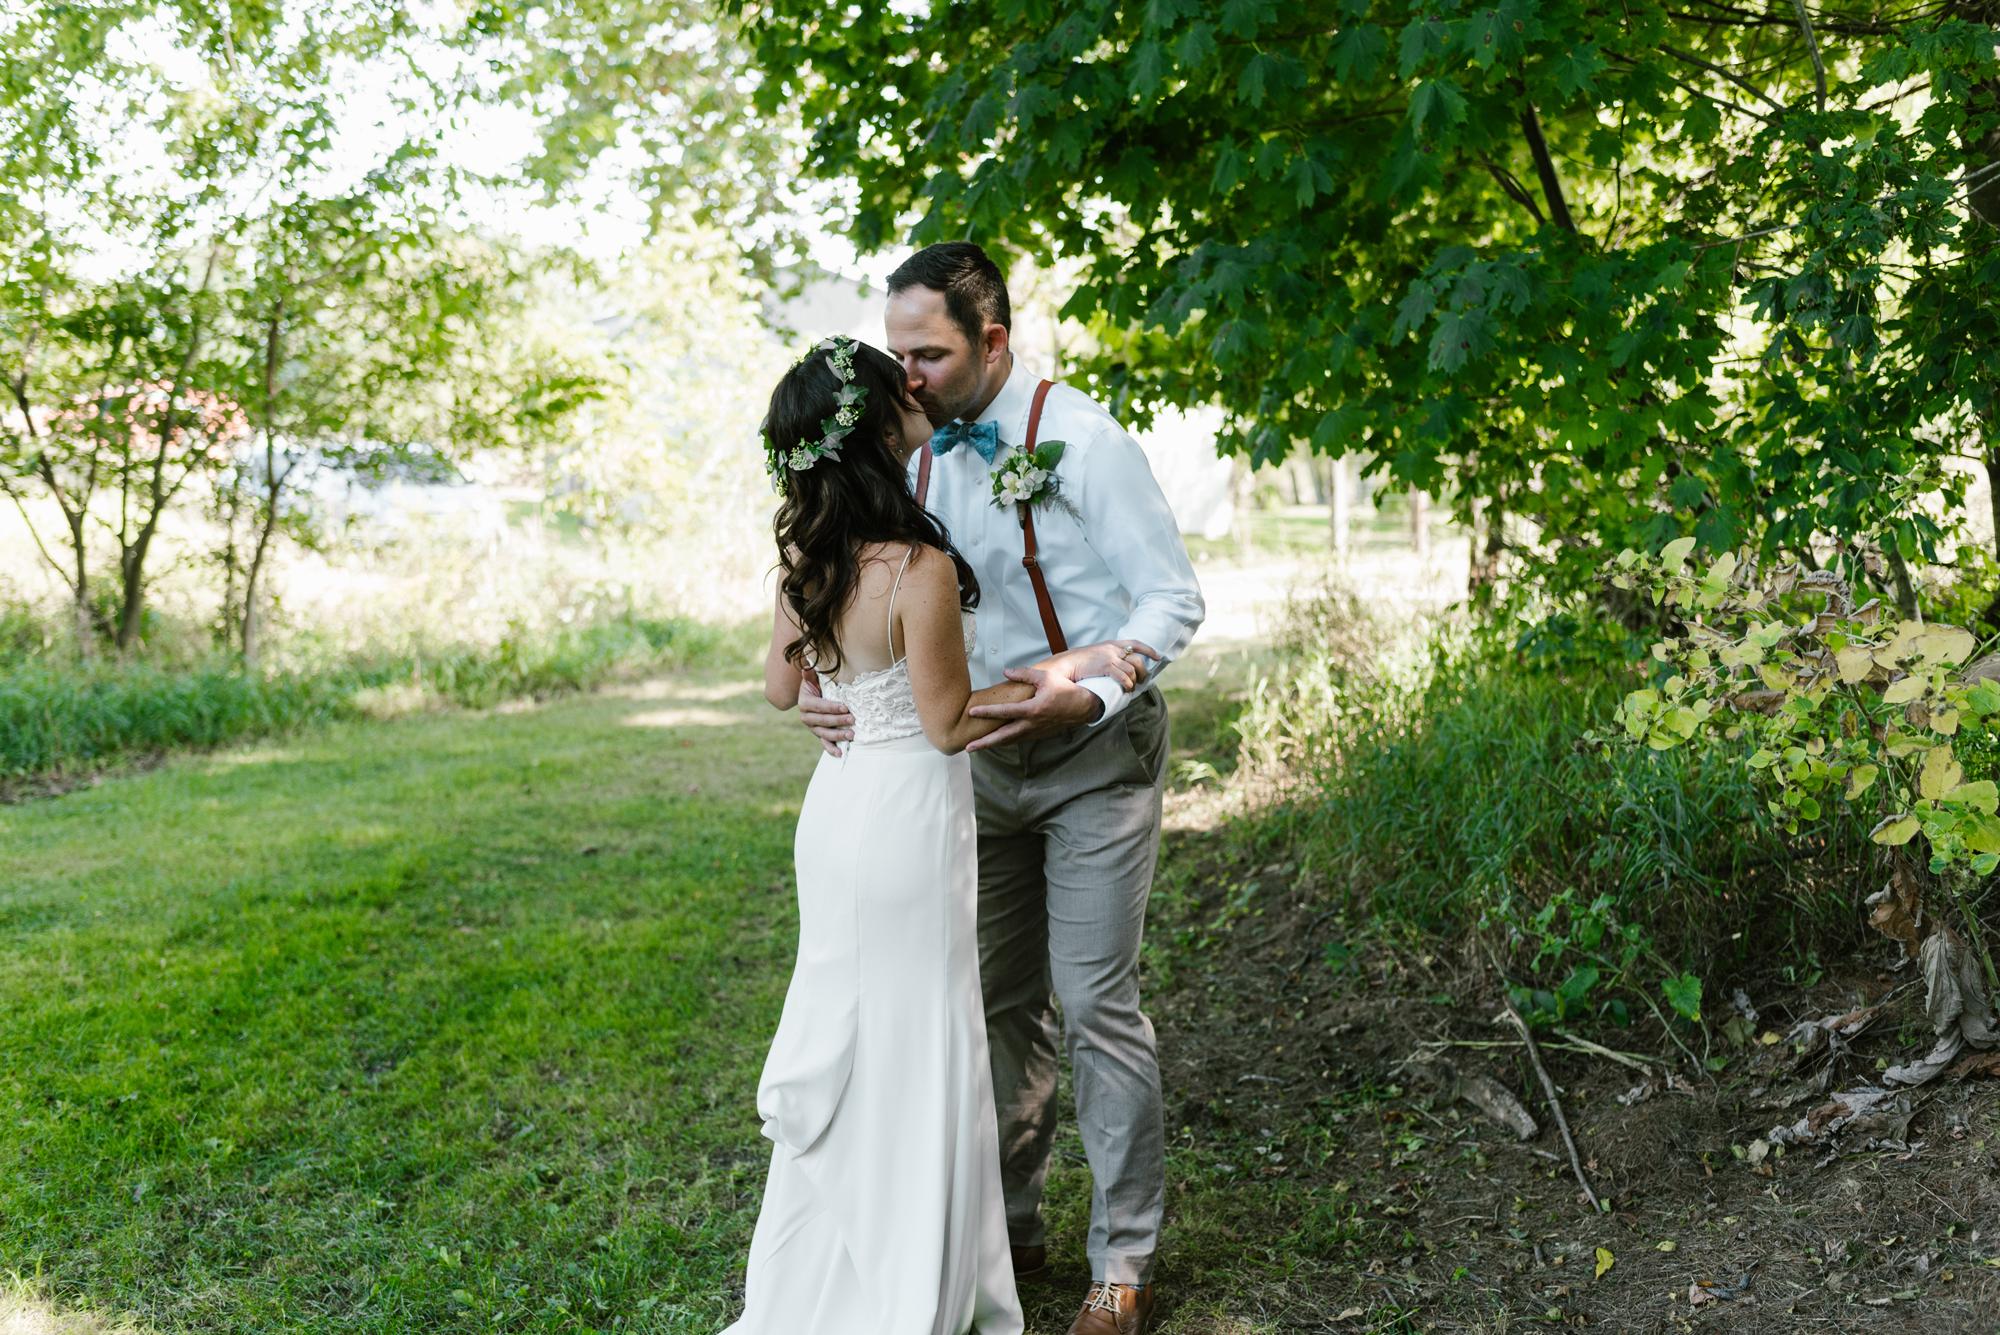 Quincy-Coldwater-Michigan-farm-wedding-photogapher-sydney-marie (51).jpg